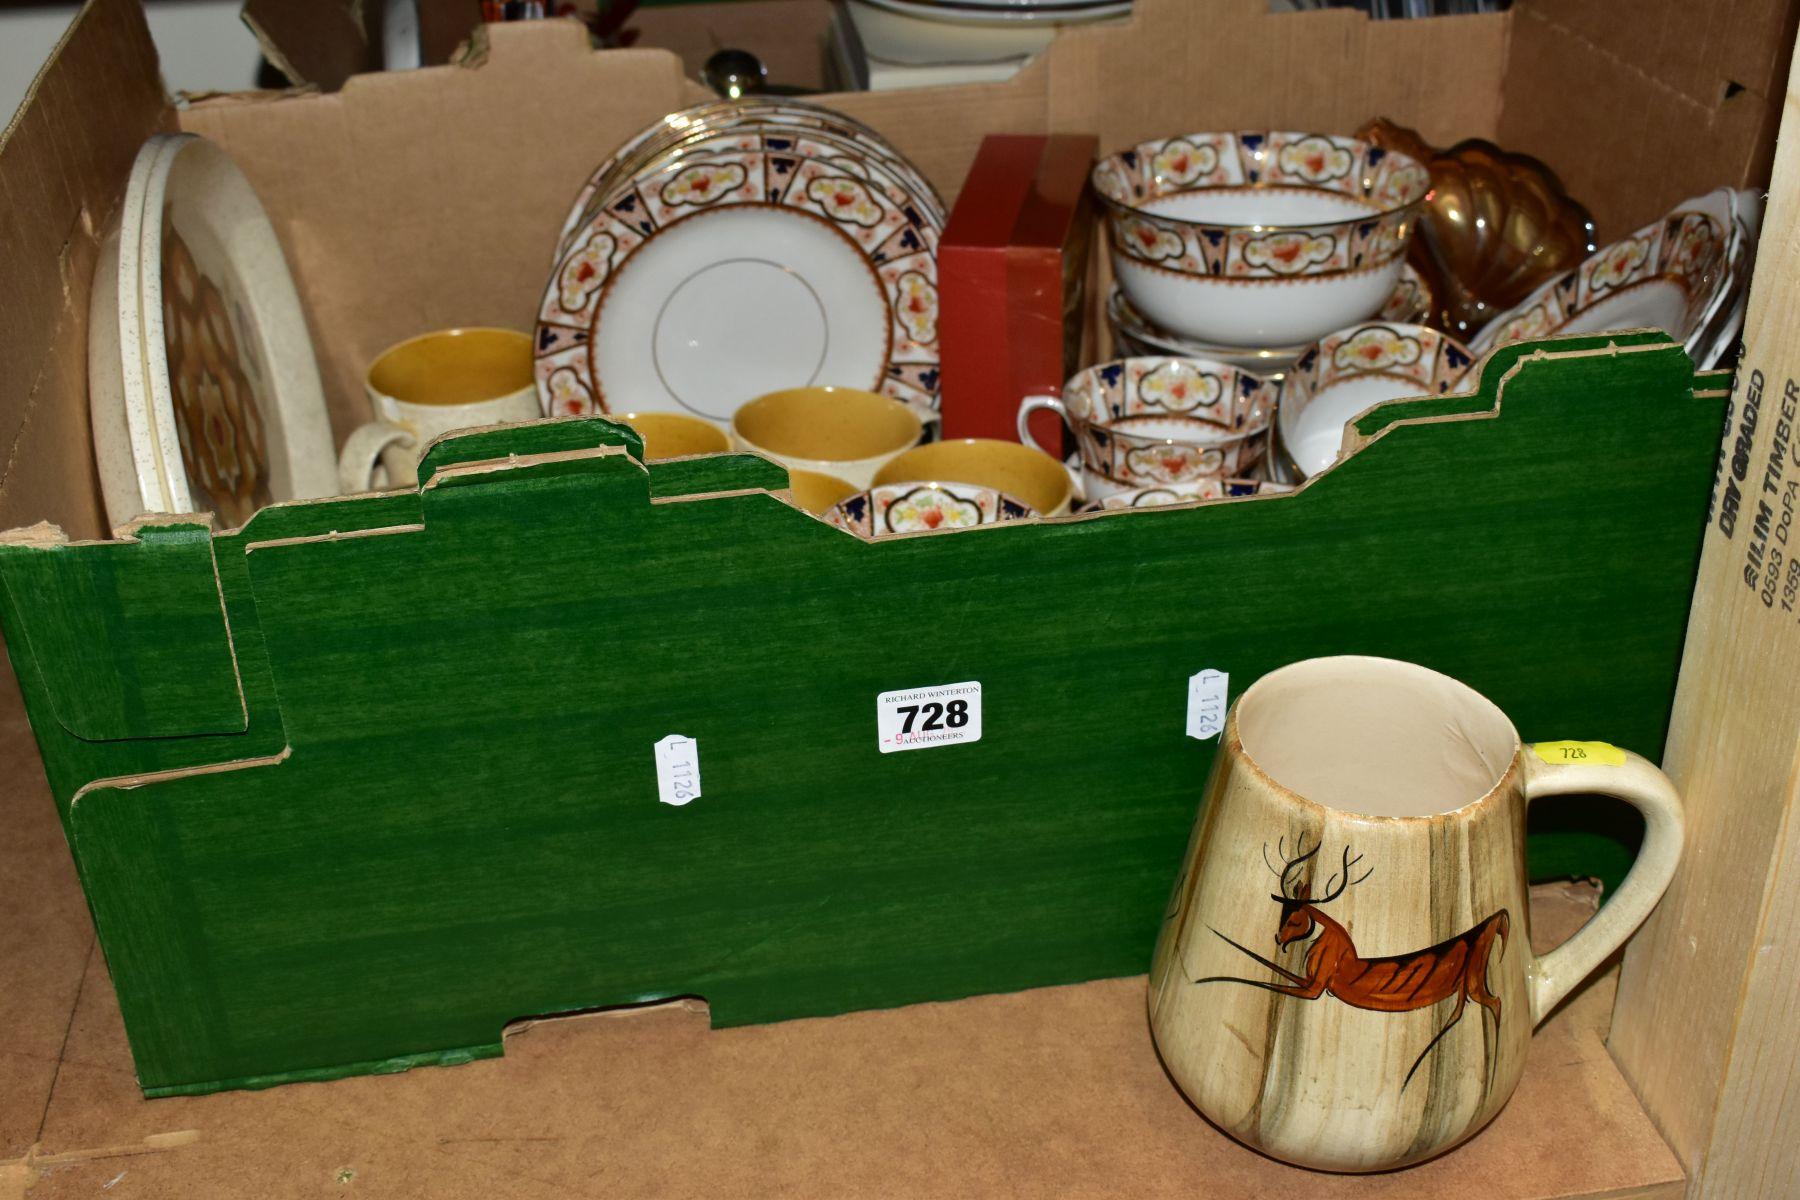 CERAMICS AND GLASS ETC, to include Melba Bone China teawares, Pallissy Casual tableware, Kalabar